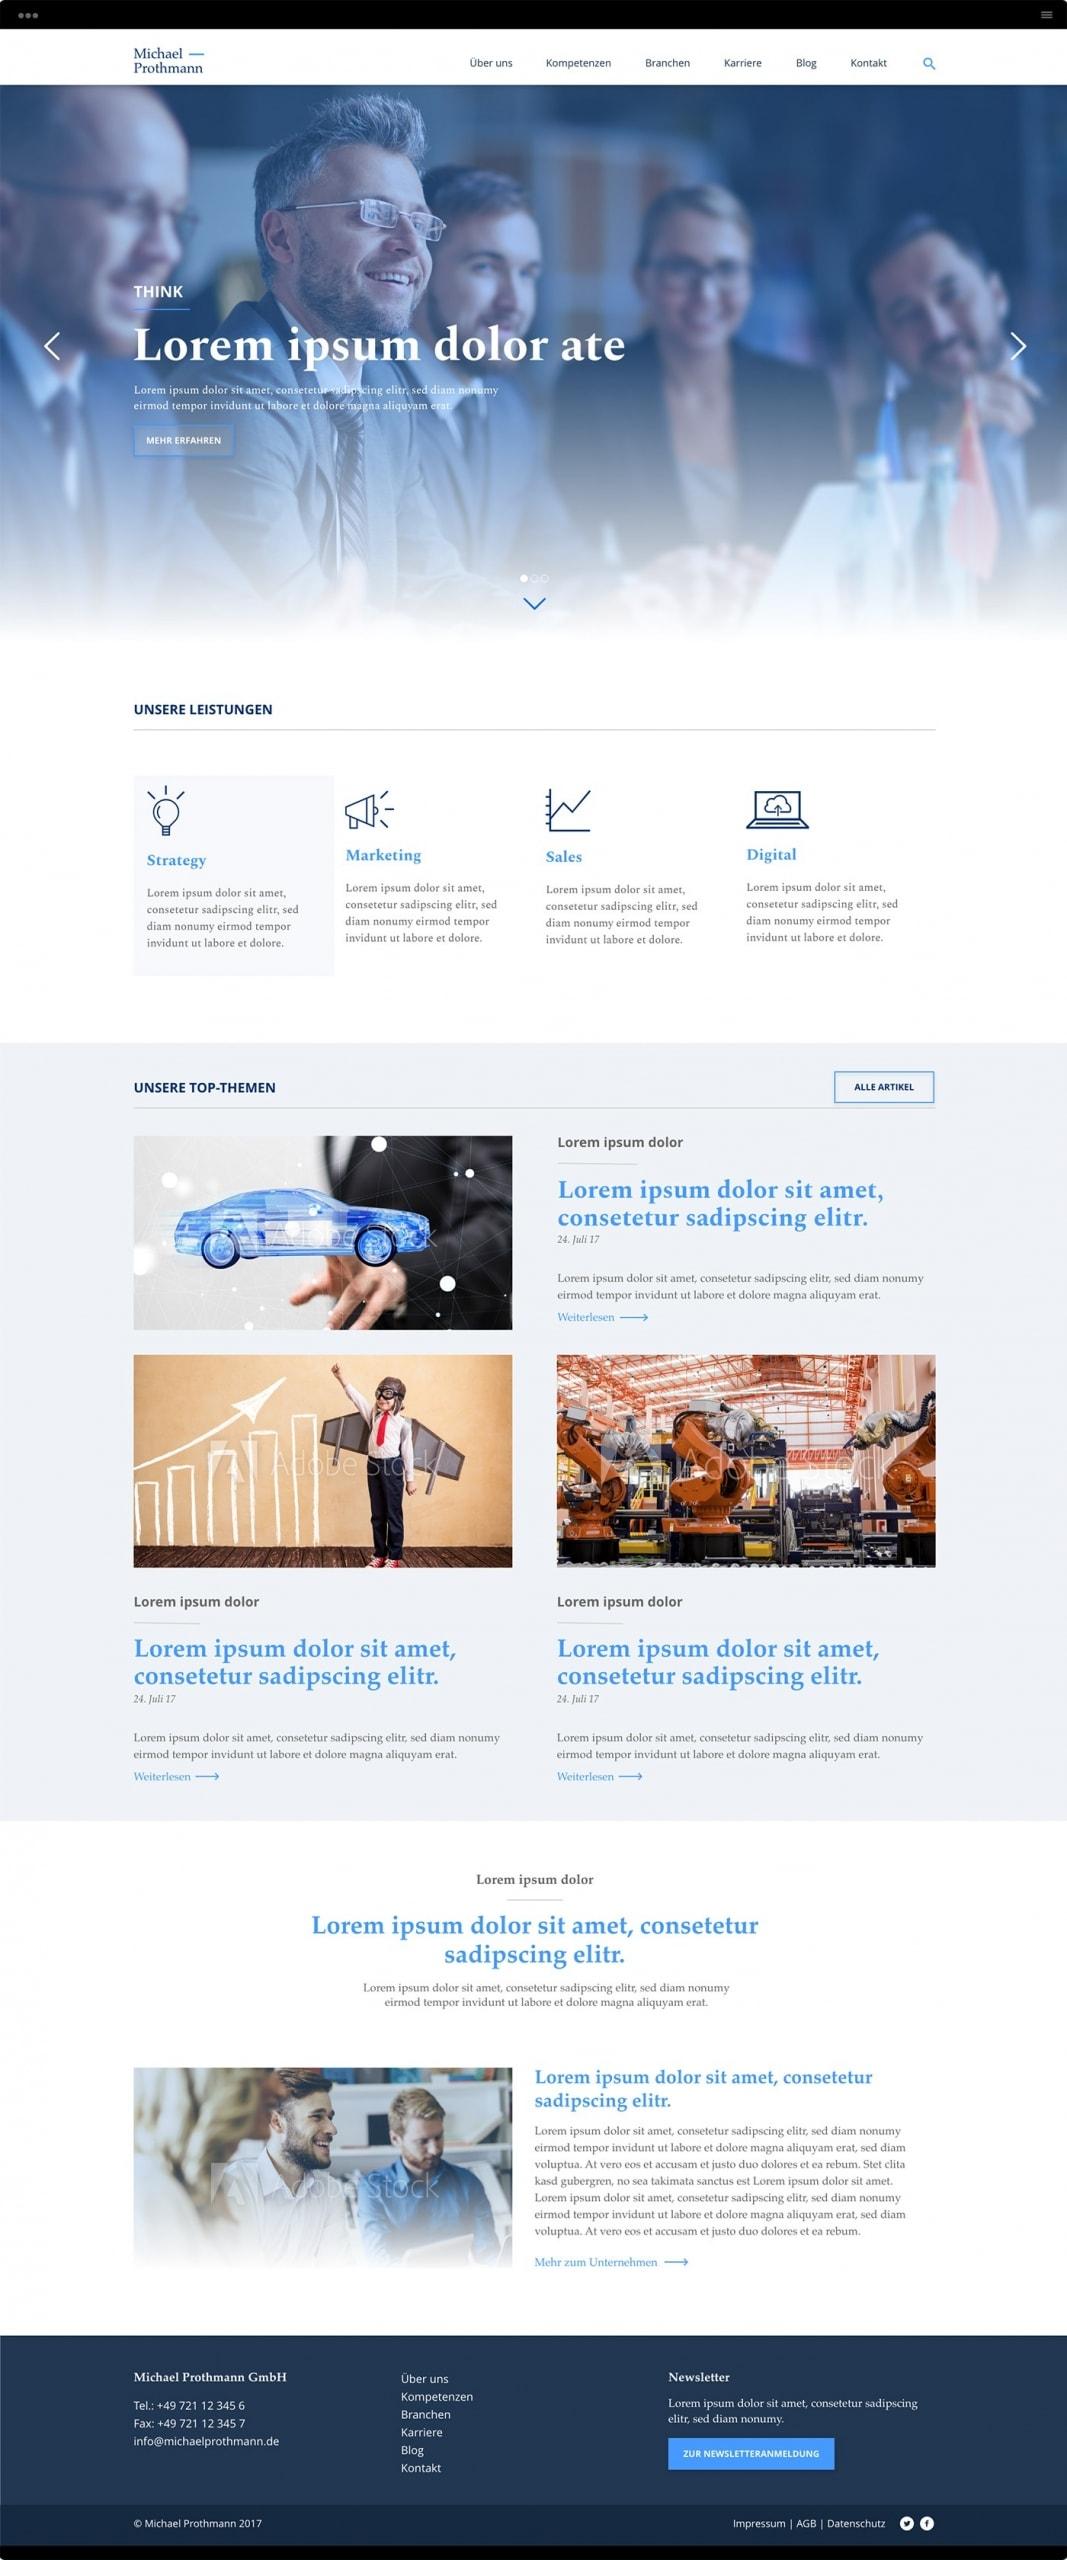 Browser Michael Prothmann Unternehmensberatung